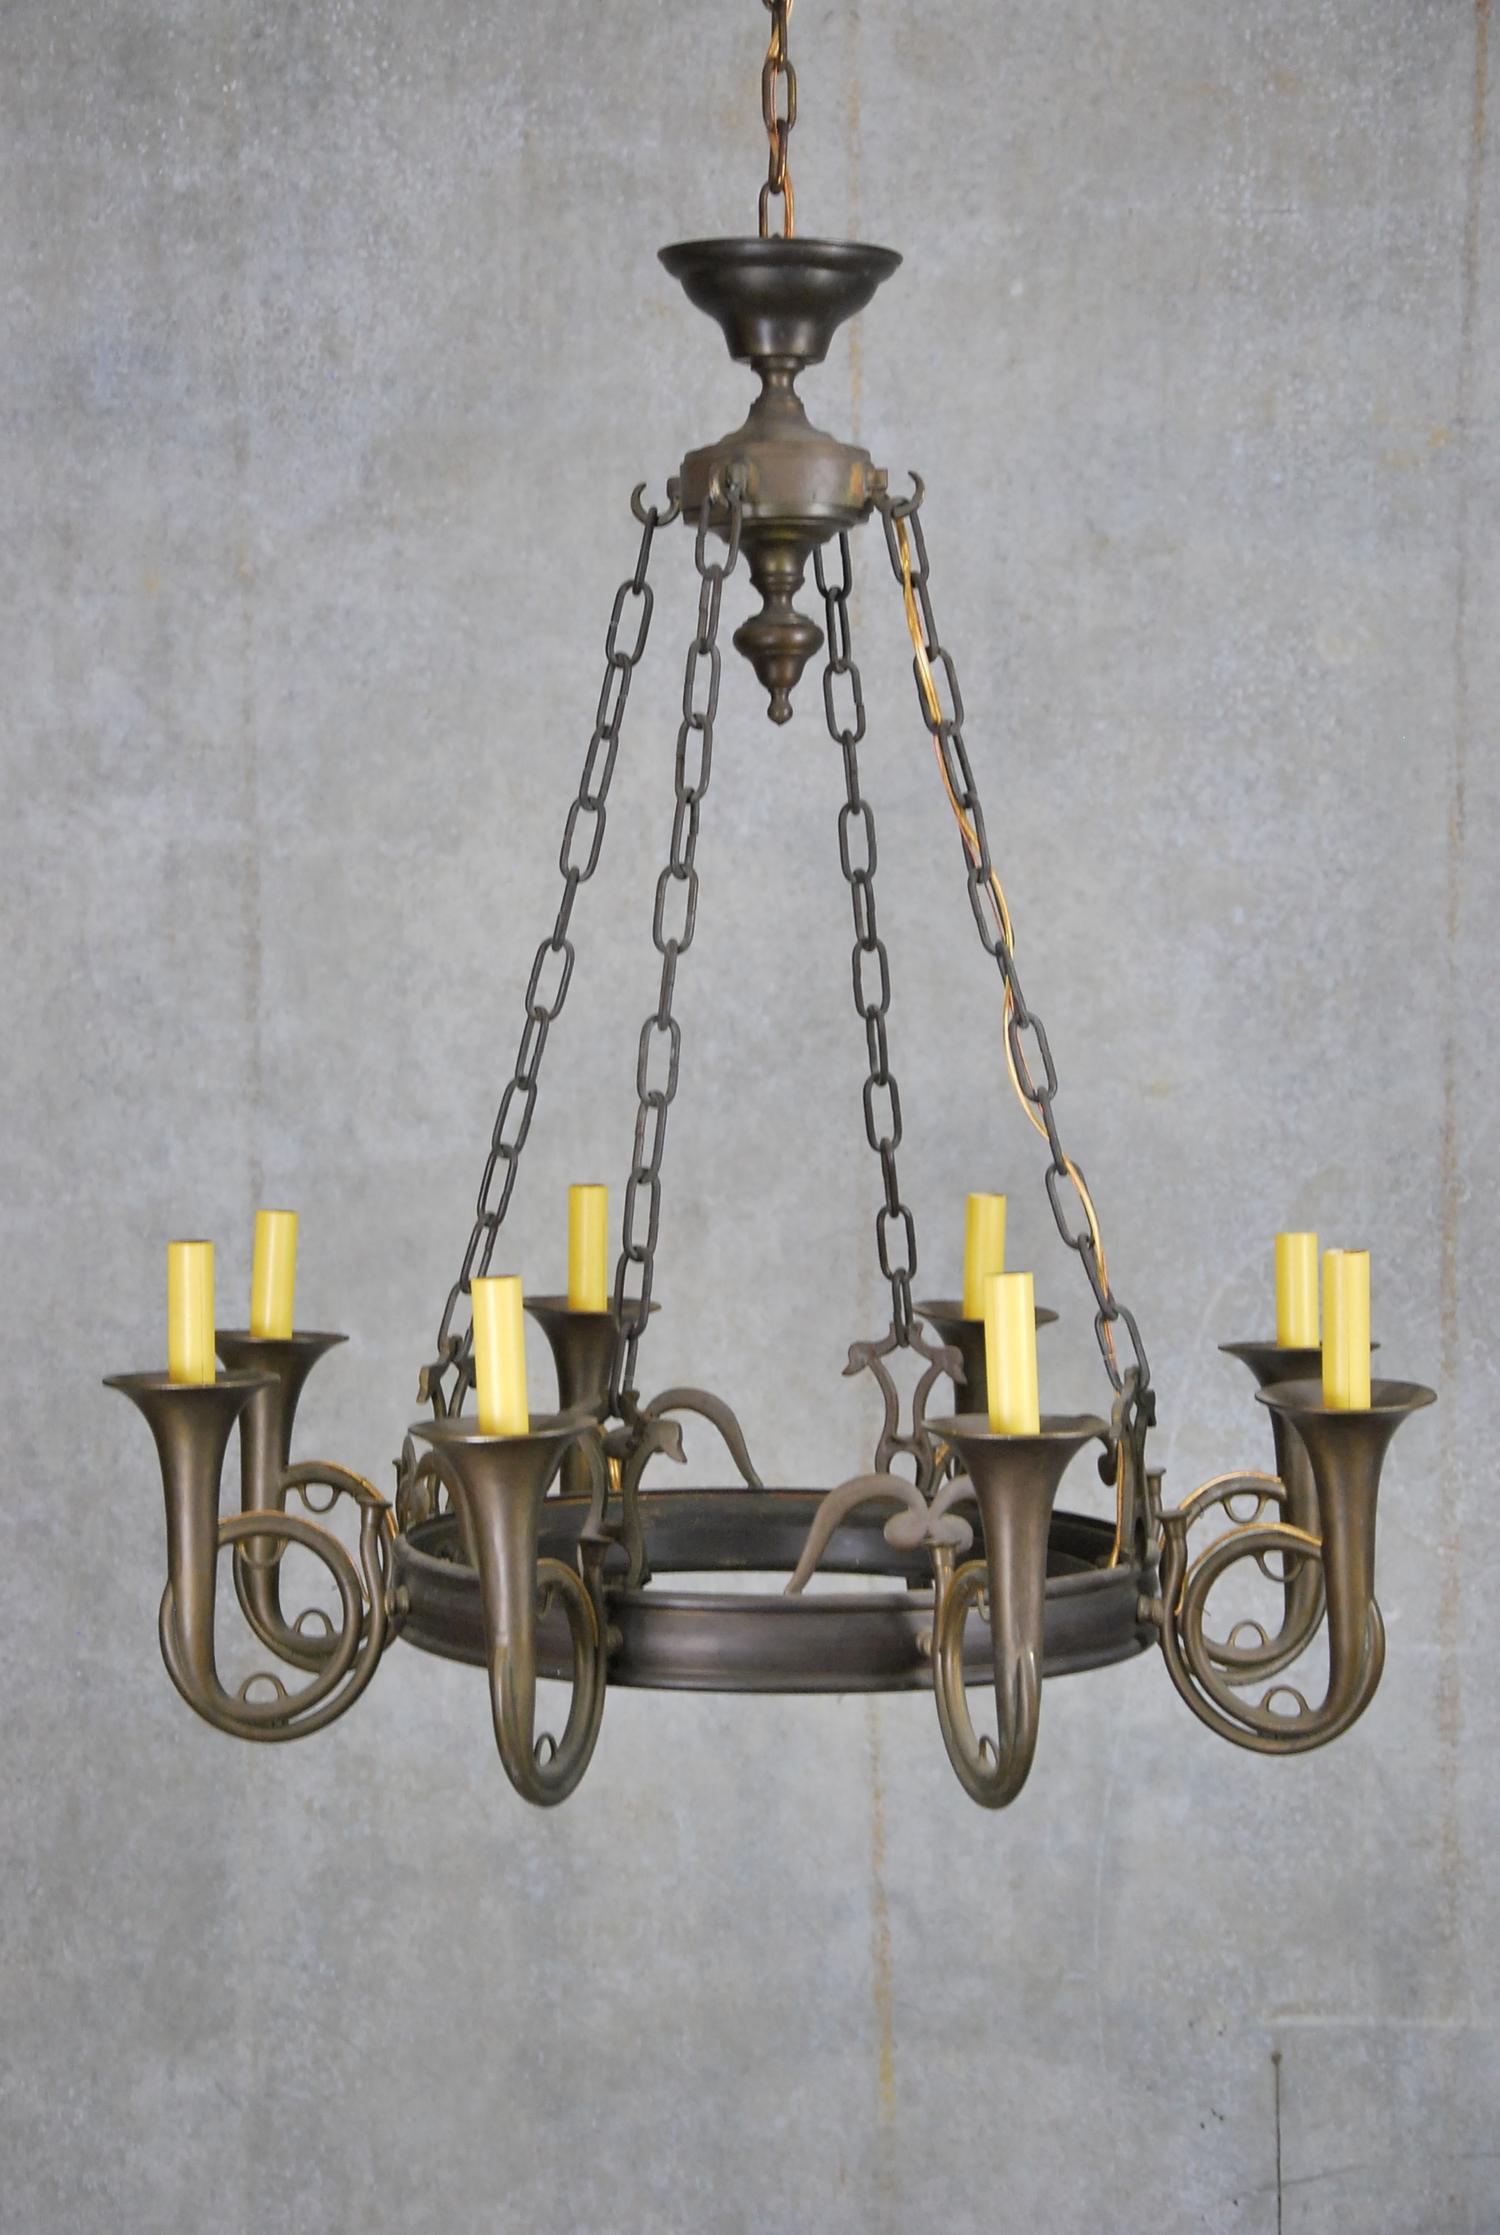 Scott landon antiques interiors 1920 rare brass french horn music 1920 rare brass french horn music chandelier aloadofball Choice Image